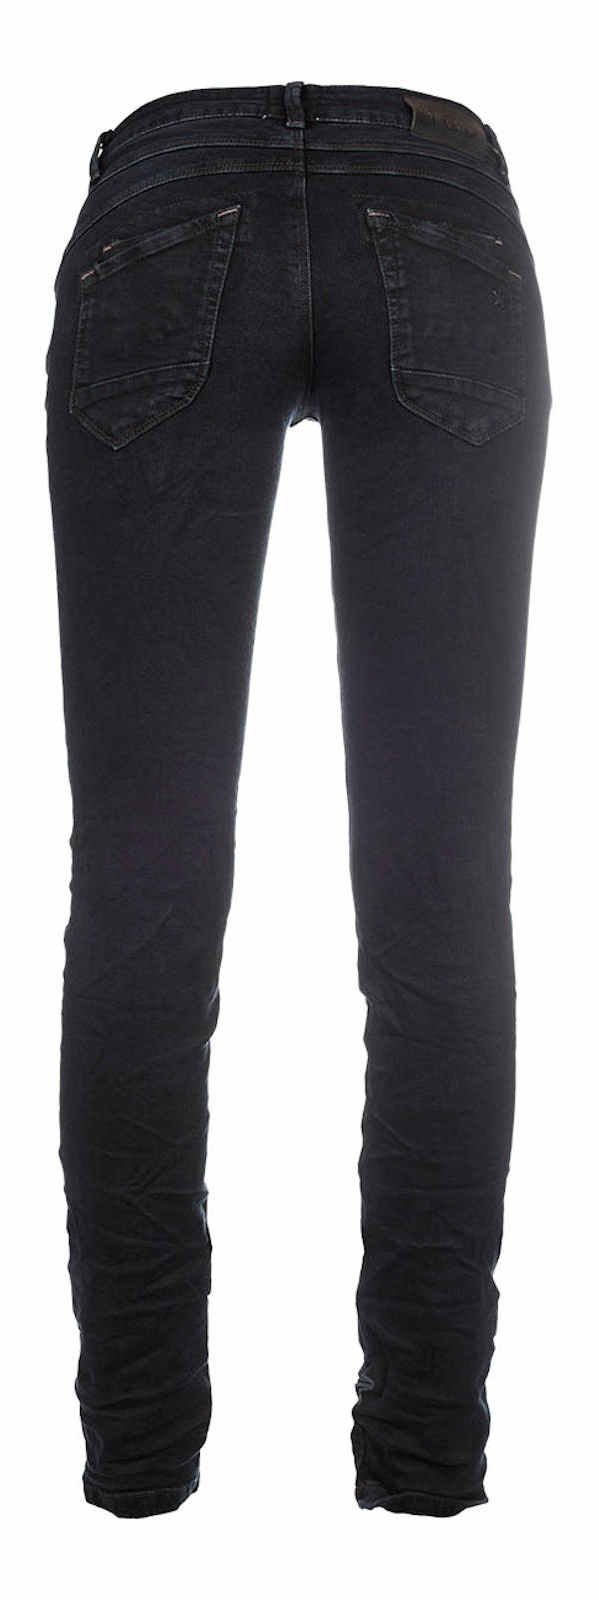 M.O.D Damen Jeans Ulla Slim AU16-2087 Hüft Hose Low Waist Slim Leg MOD Schwarz